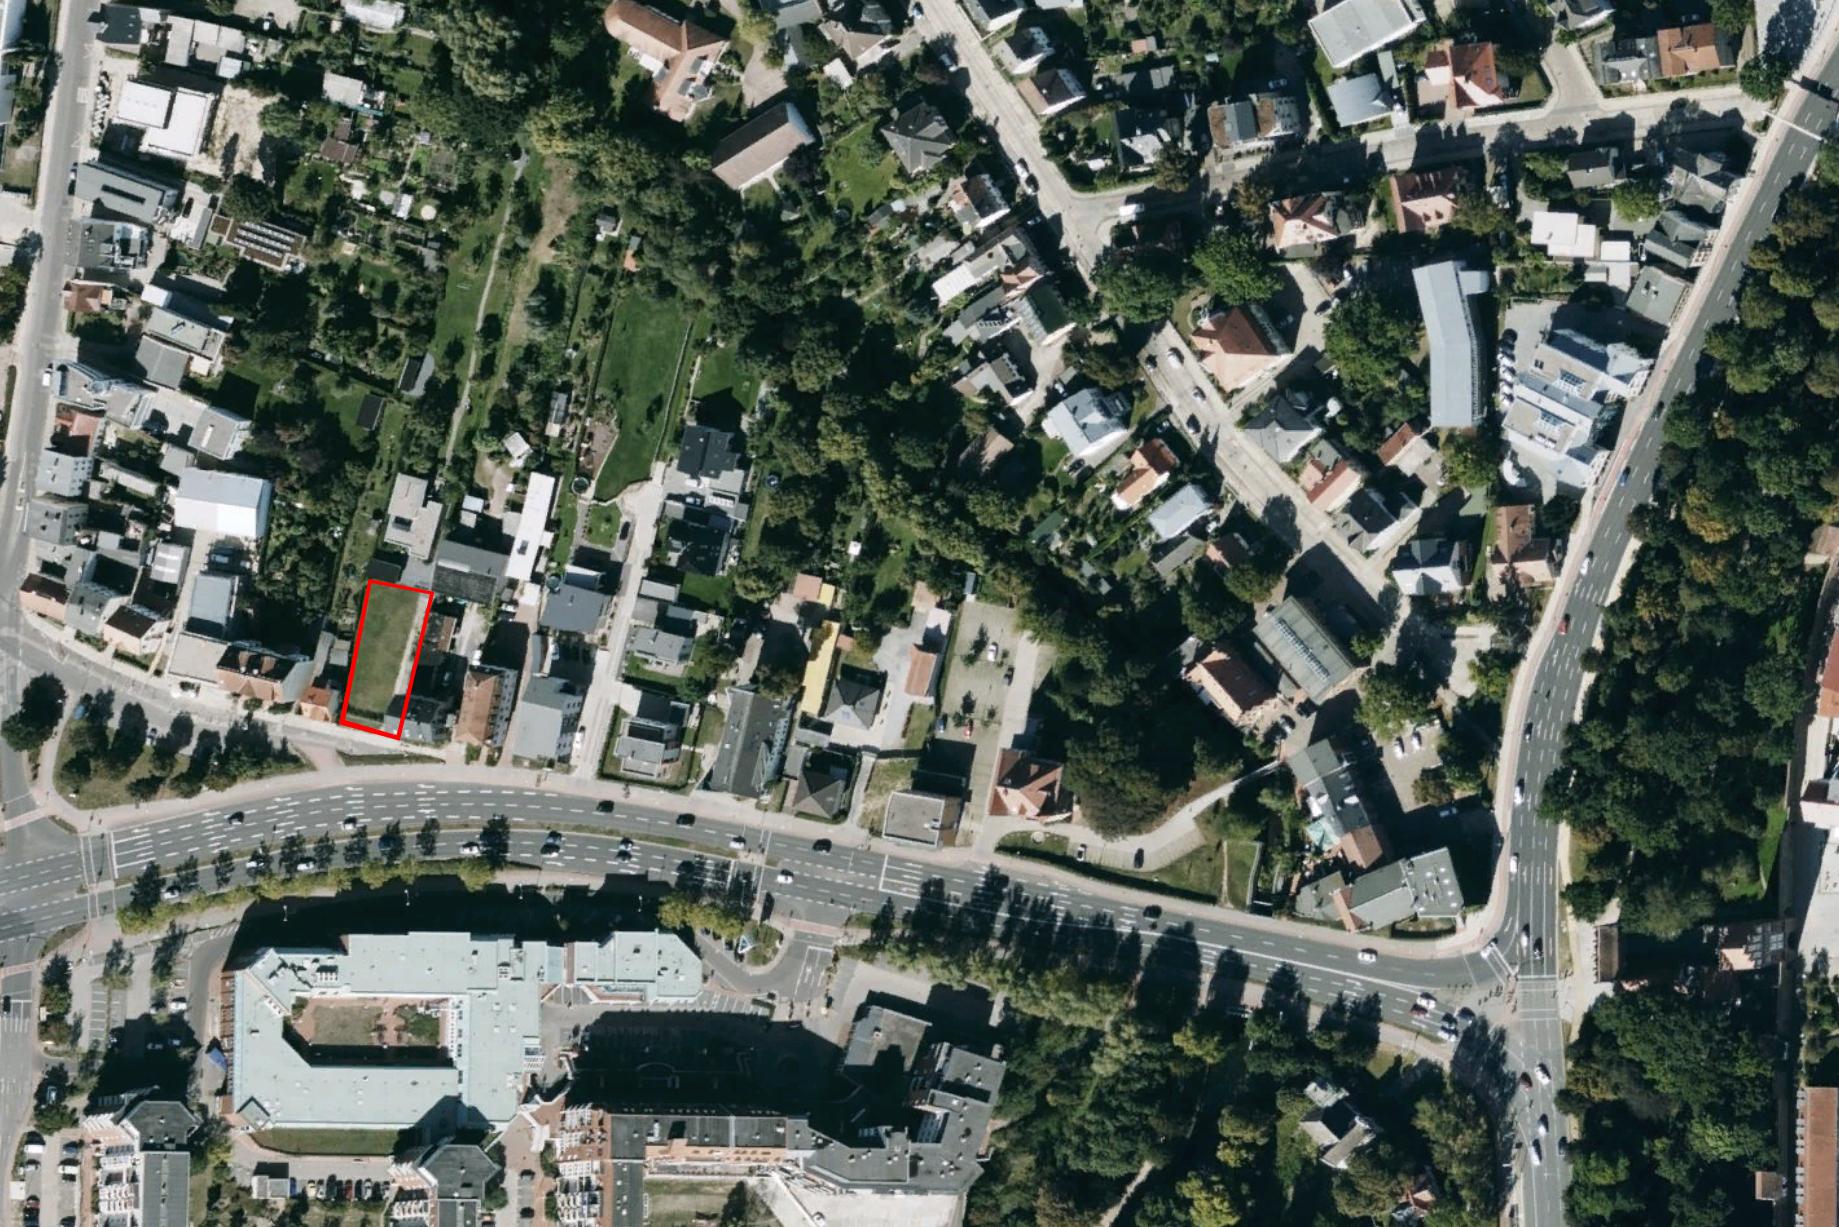 Rostocker Strasse, aerial view